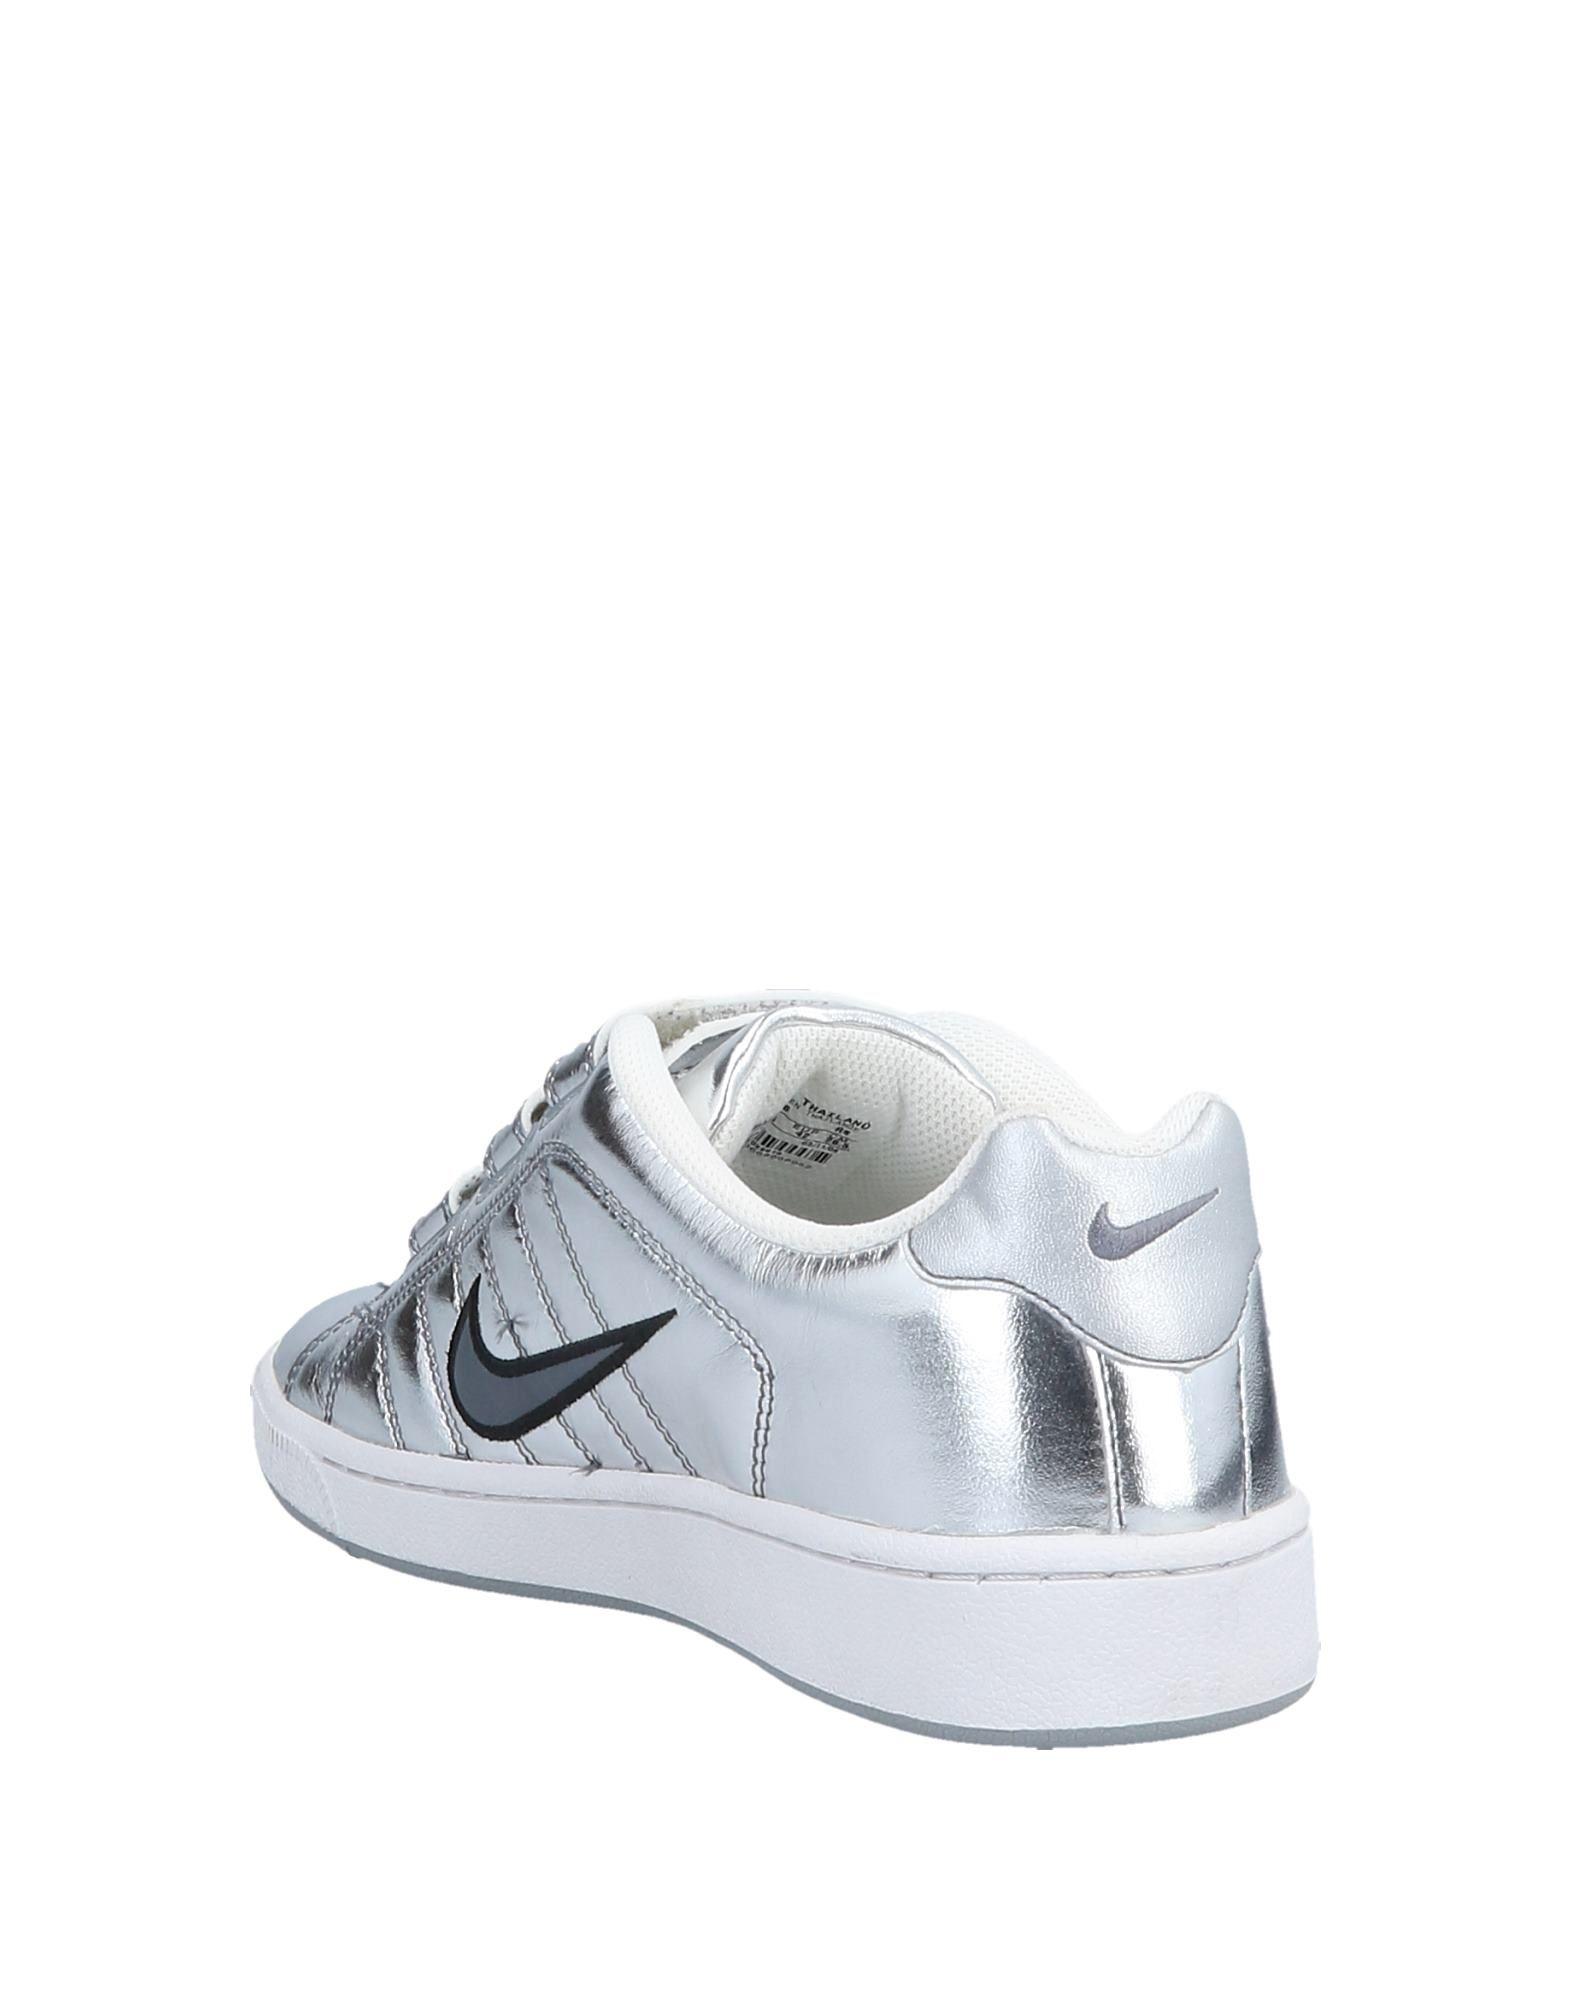 Rabatt echte  Schuhe Nike Sneakers Herren  echte 11572357OK ca1461